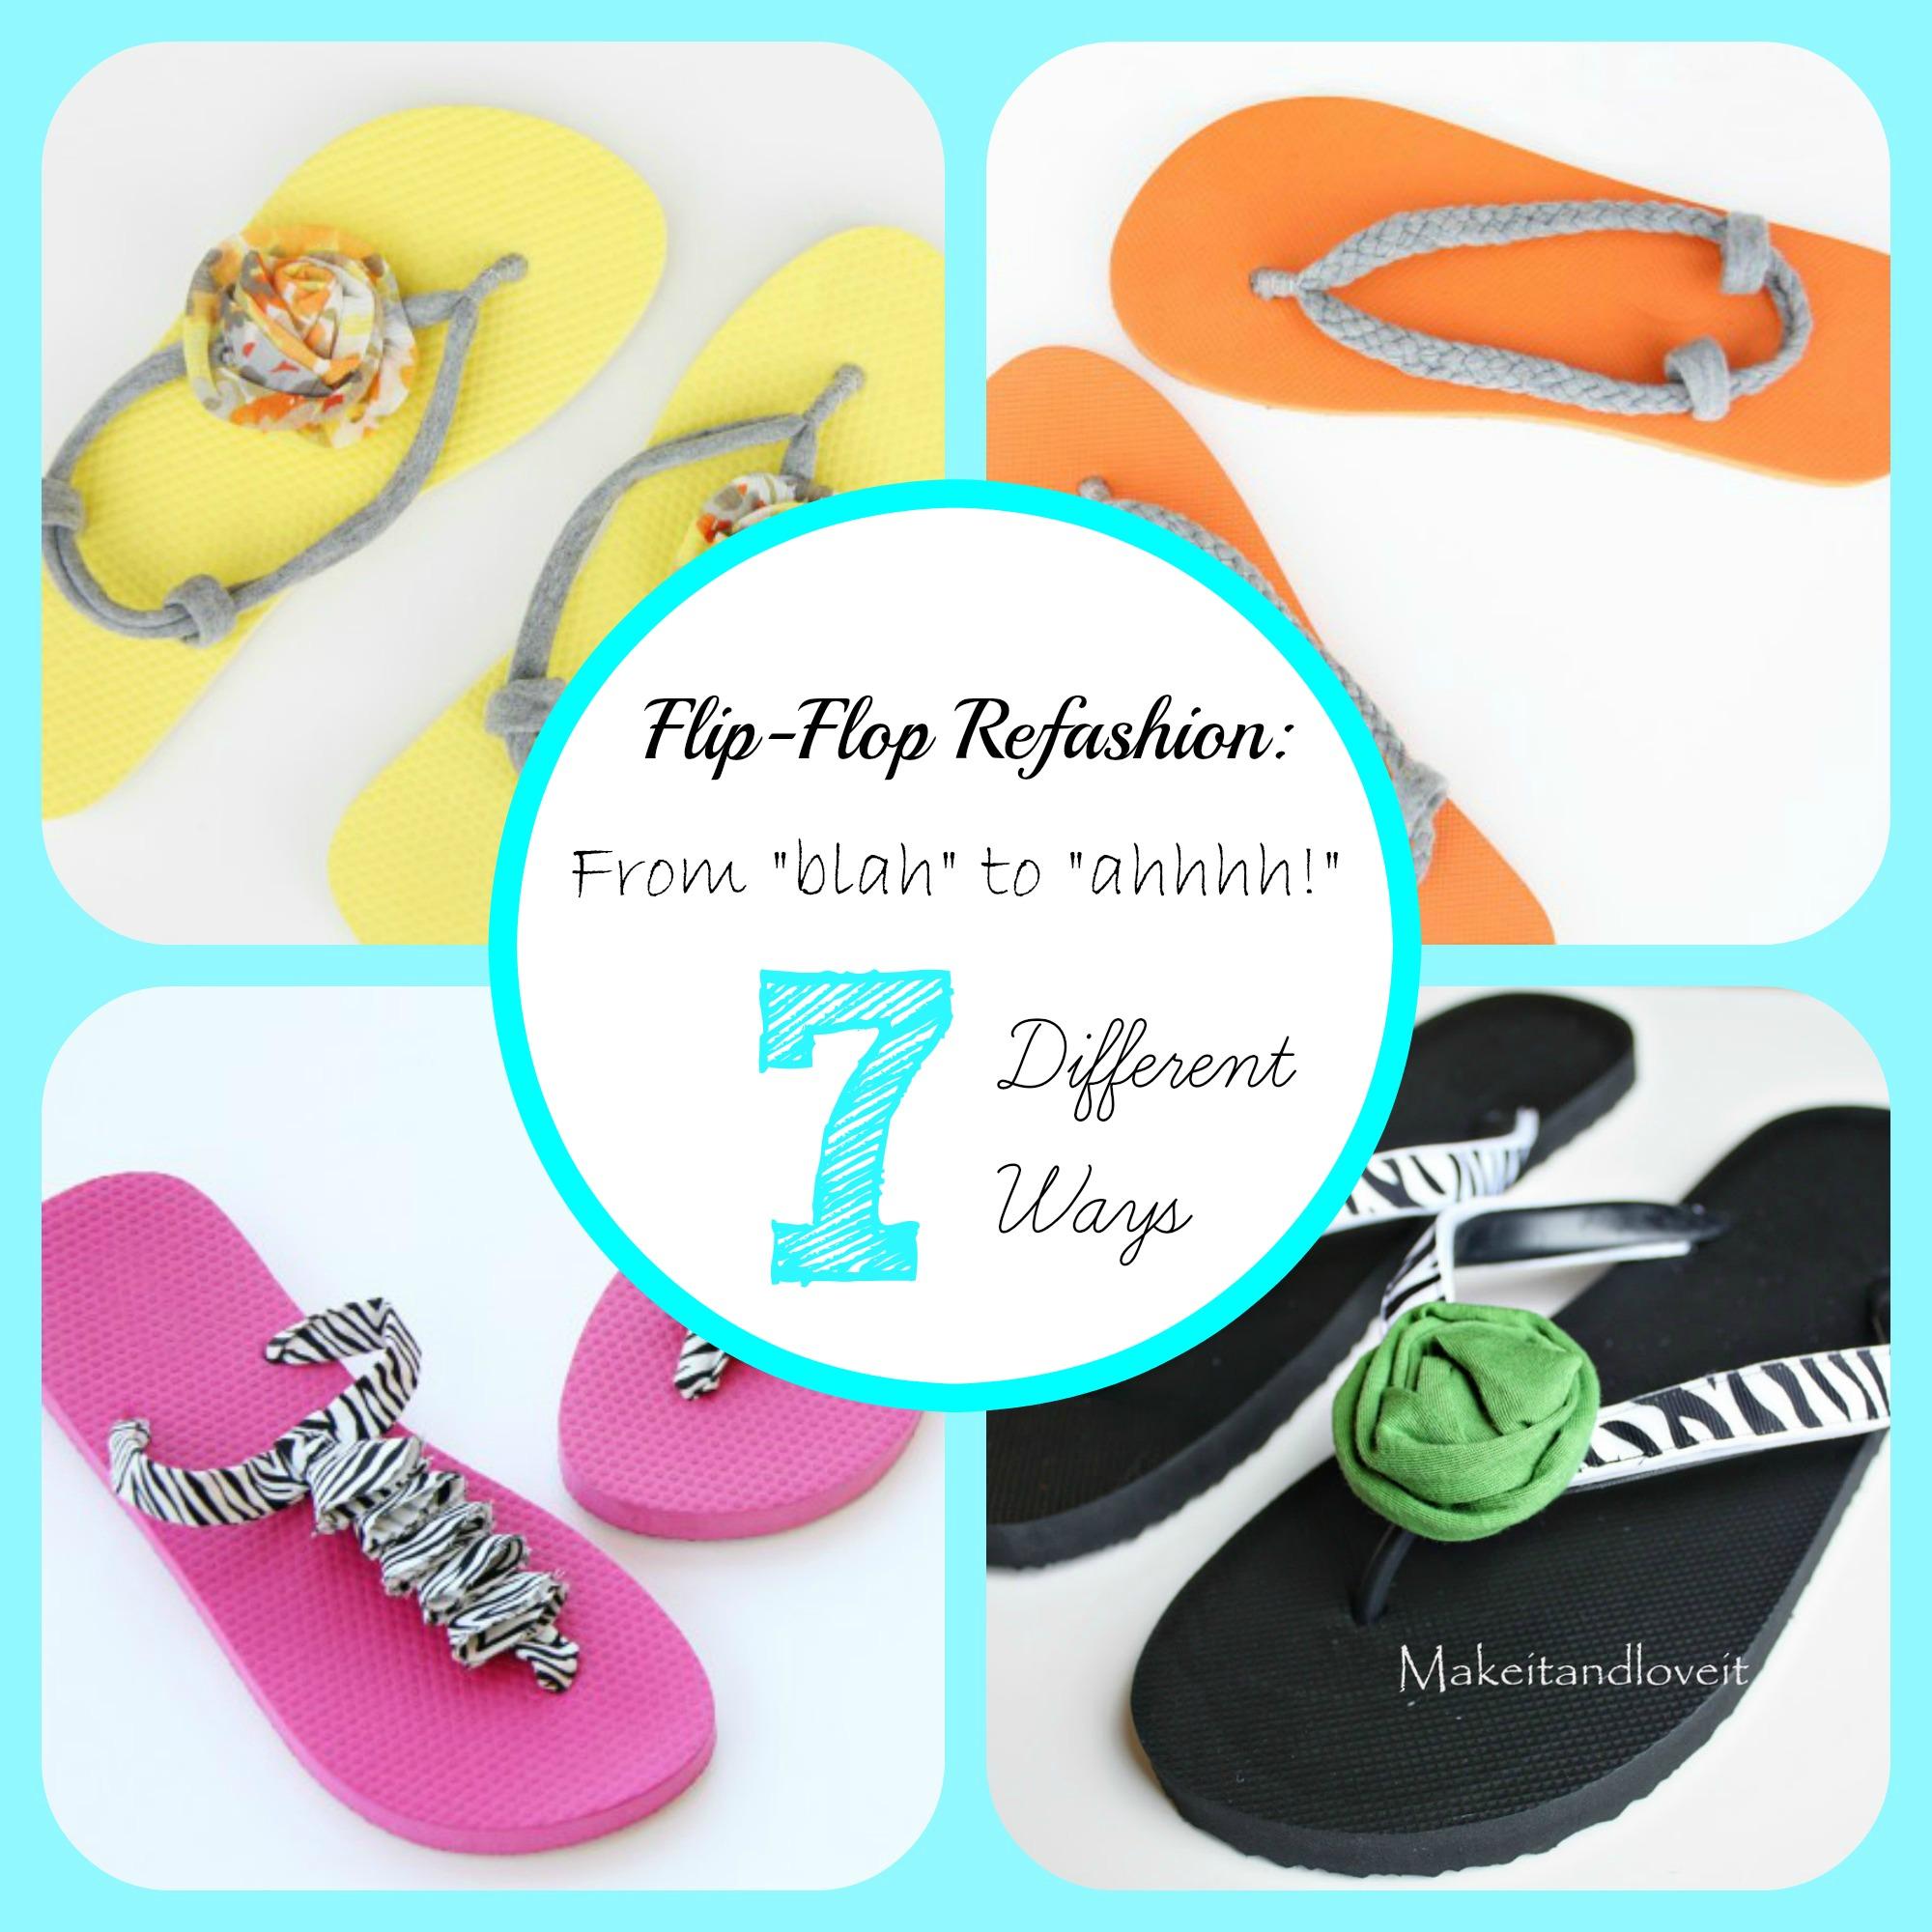 "Flip-Flop Refashion: from ""blah"" to ""ahhhhh!""  – 7 Different Ways"